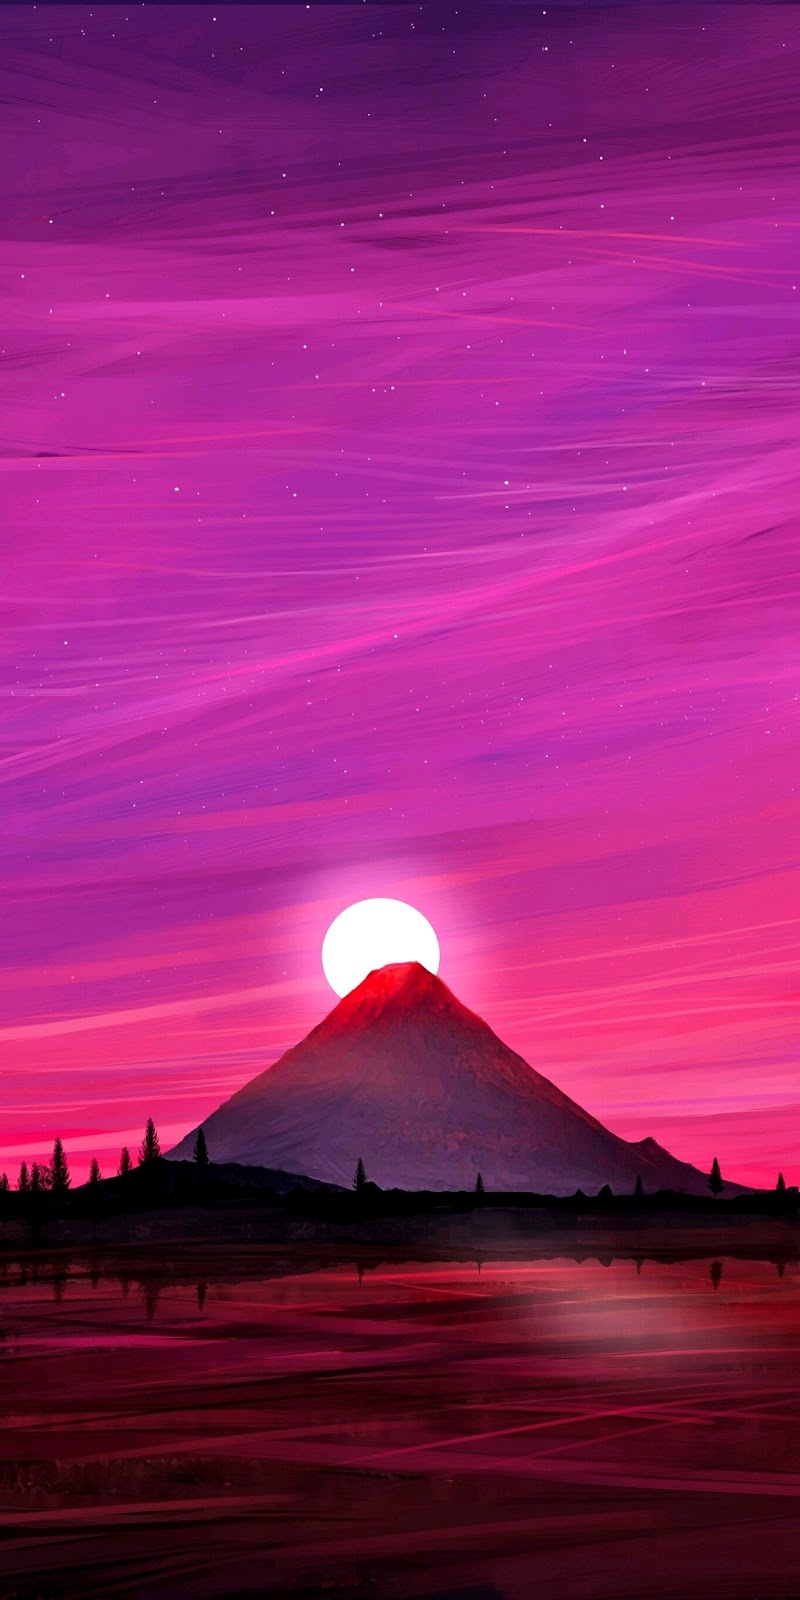 Purplish sky